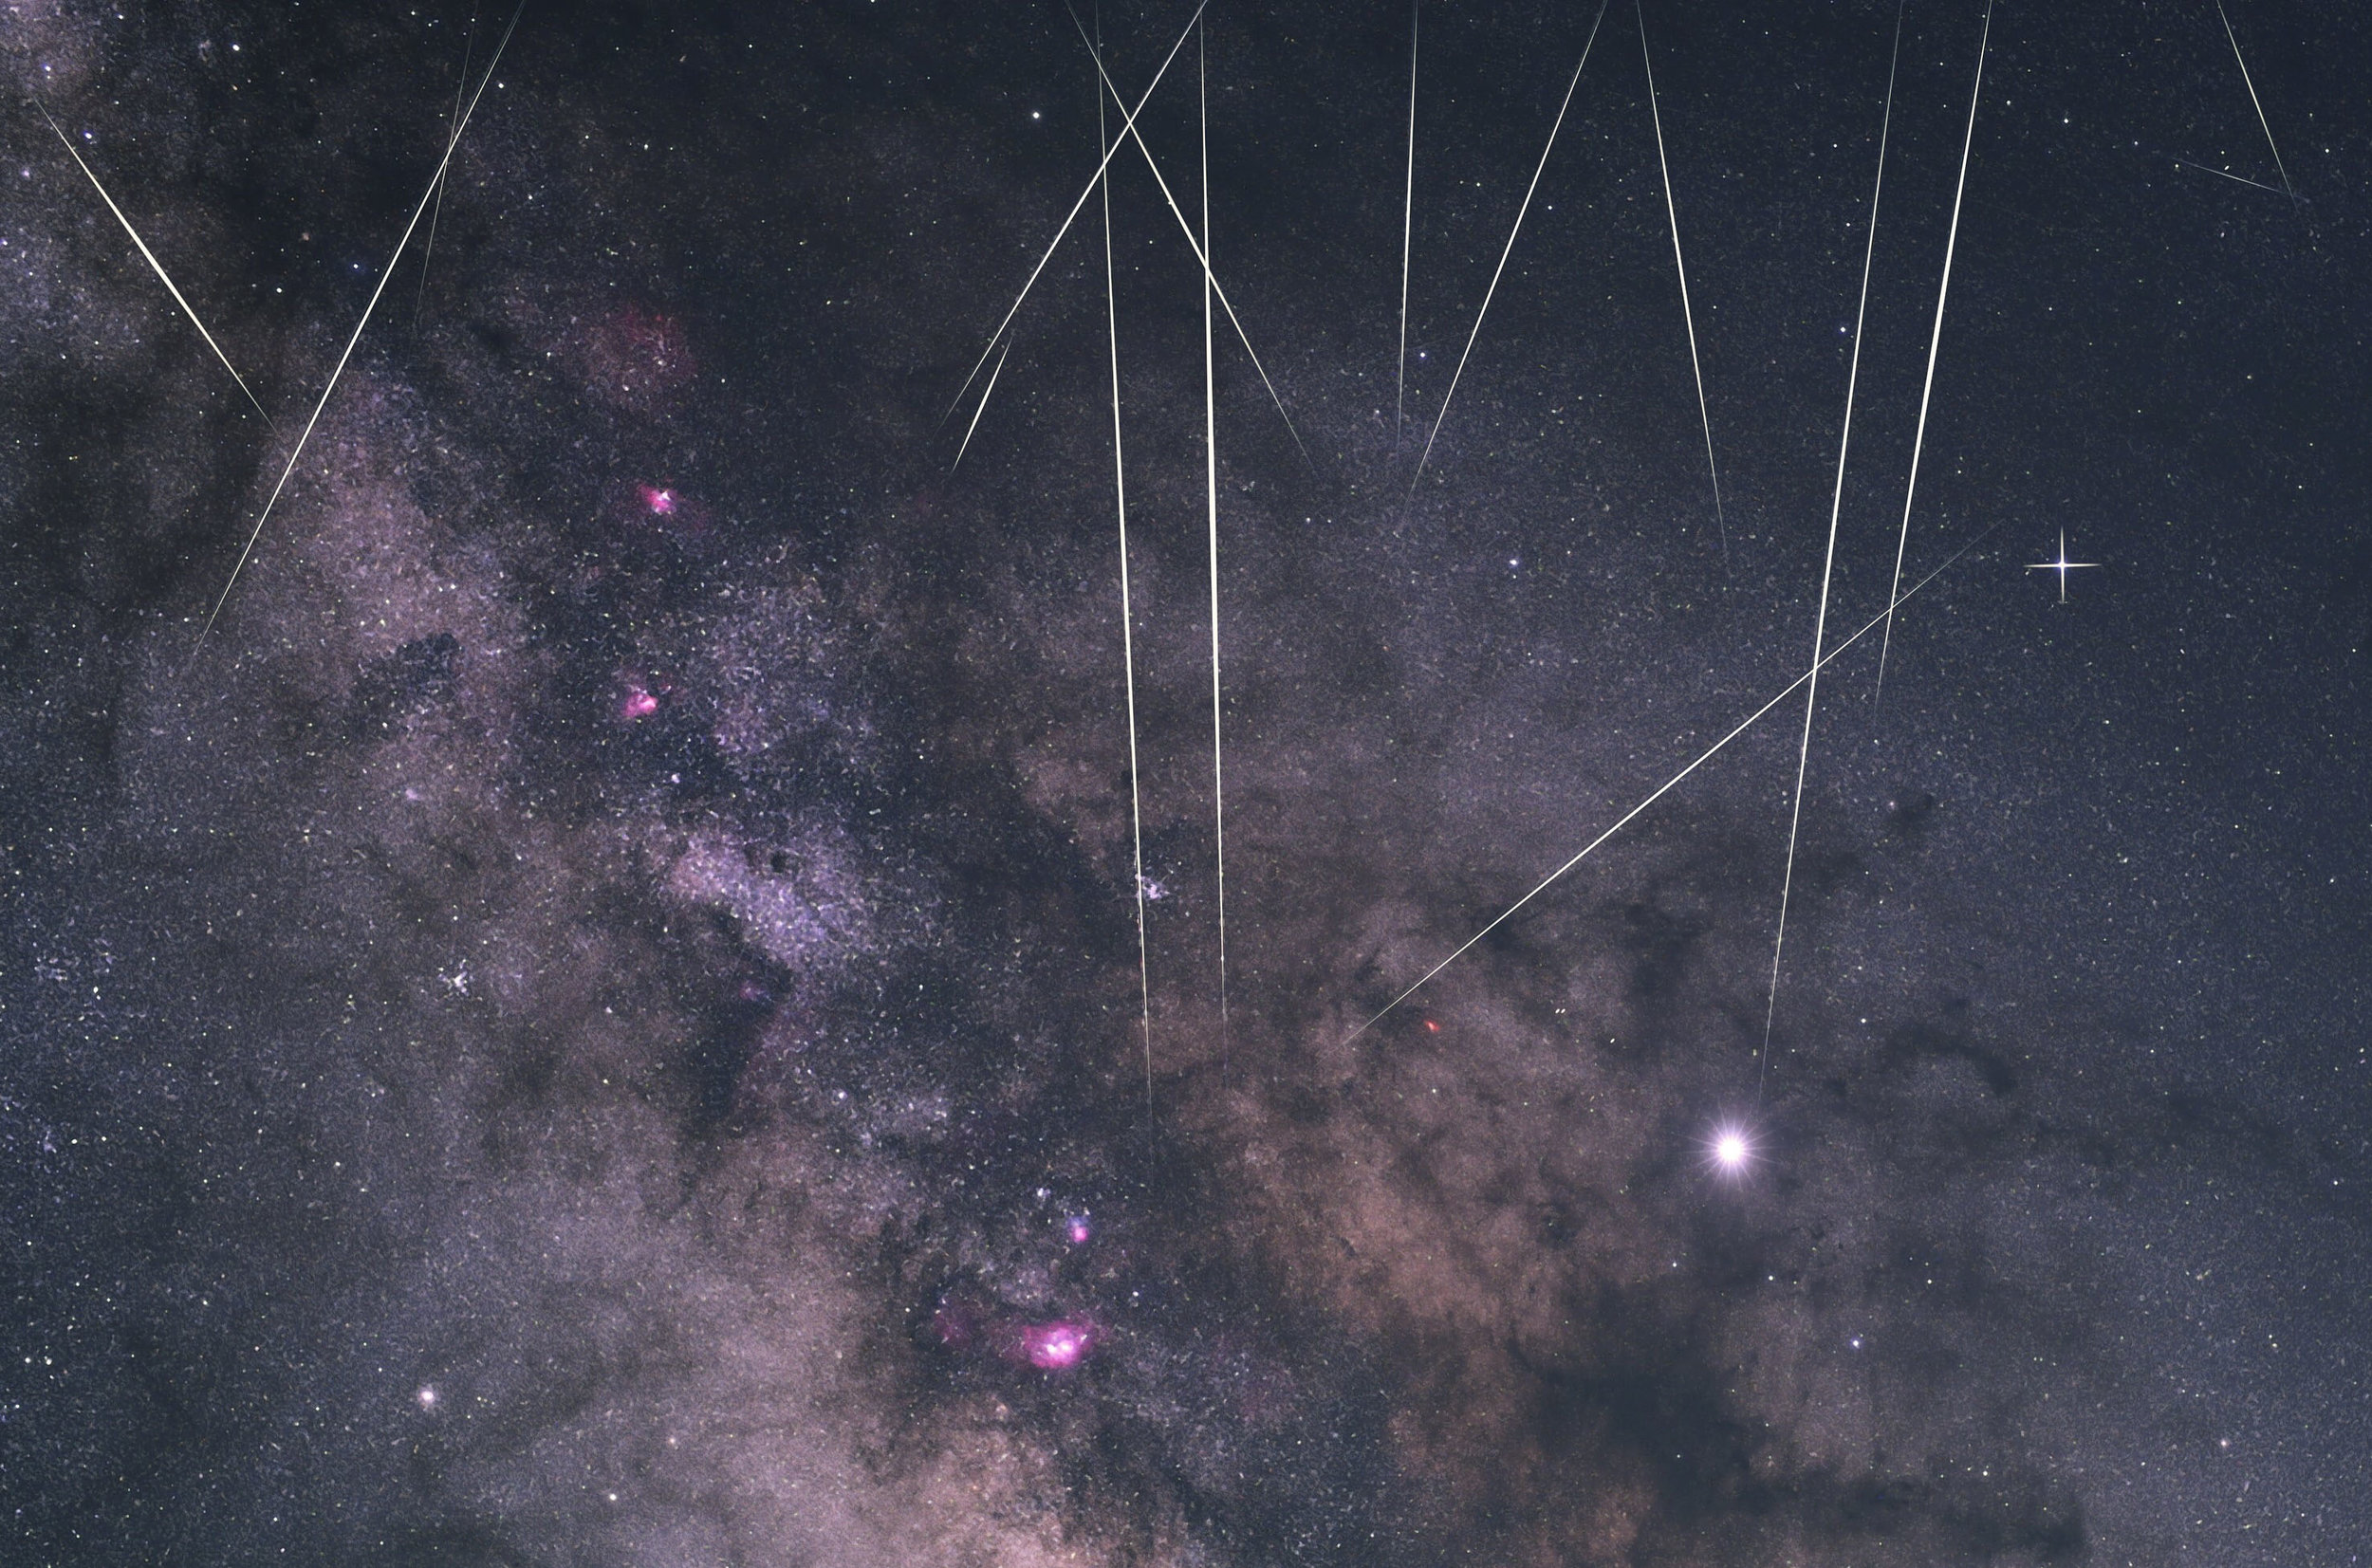 Closeup of  @alpineastro 's meteors over Mt. Shasta